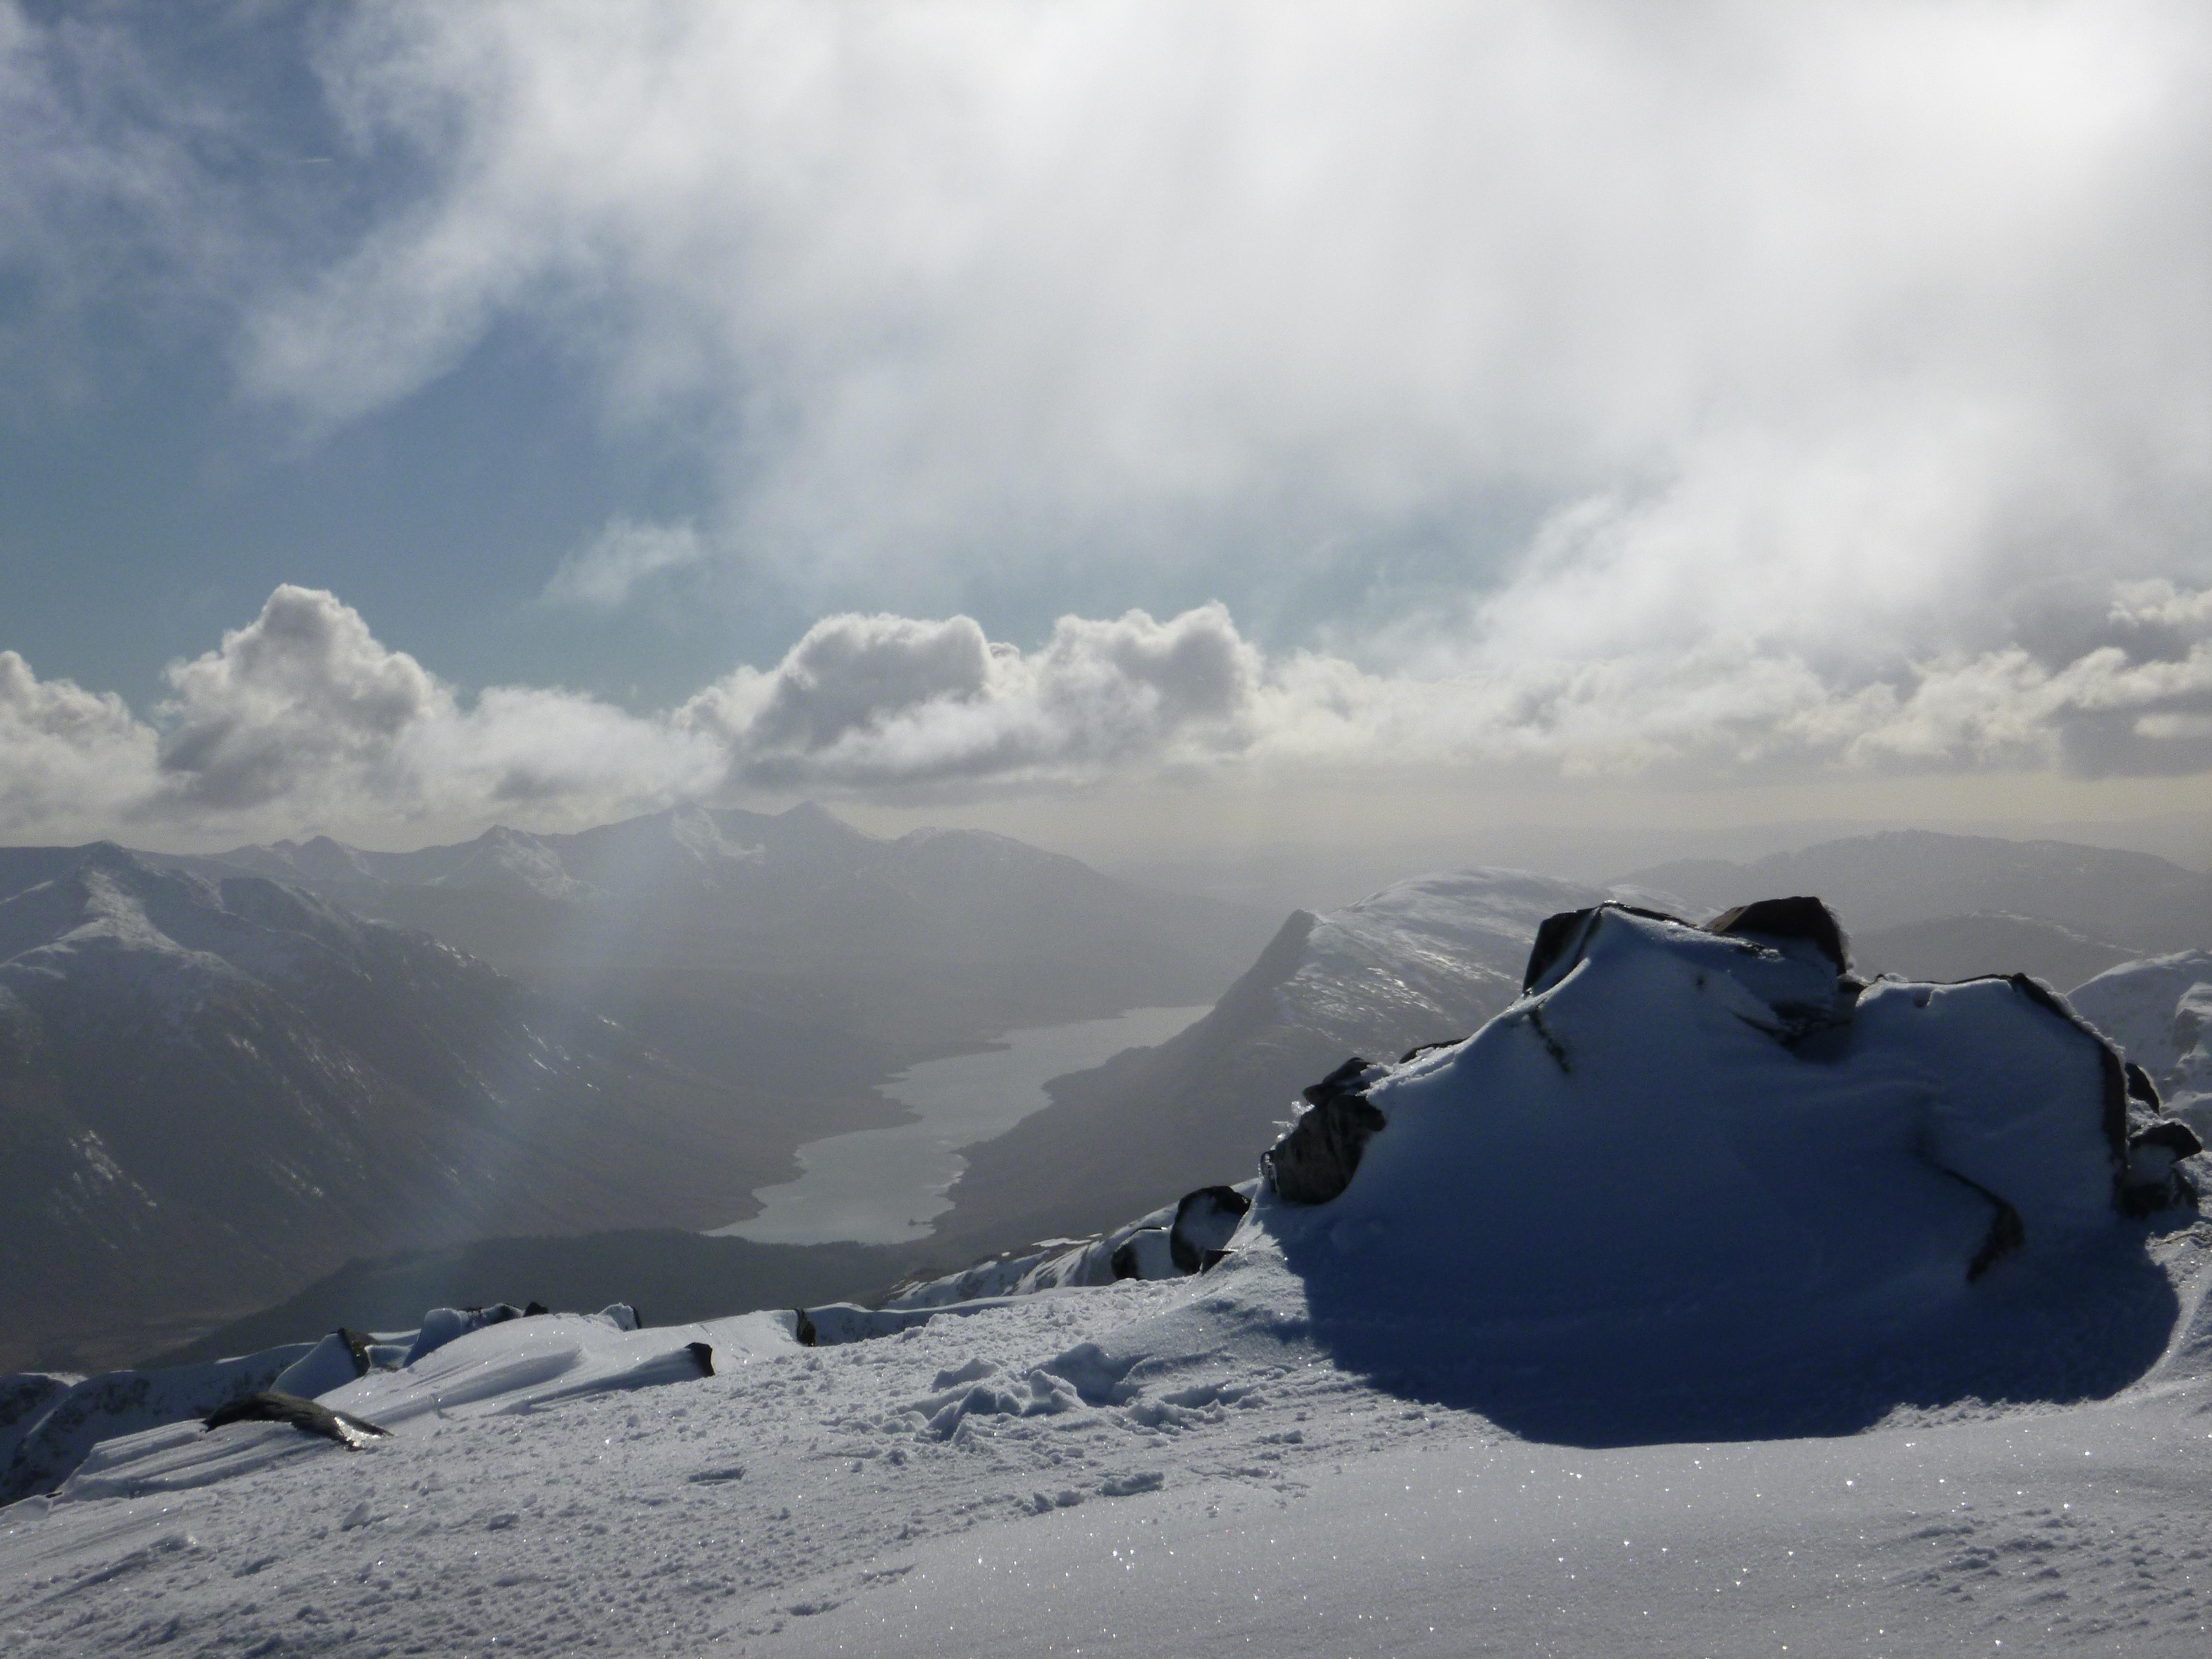 Guided Winter Walking with Lochaber Guides. Carn Mor Dearg Arete in Winter, CMD Winter,  Ben Nevis Winter Skills, Winter Skills Courses in Scotland,